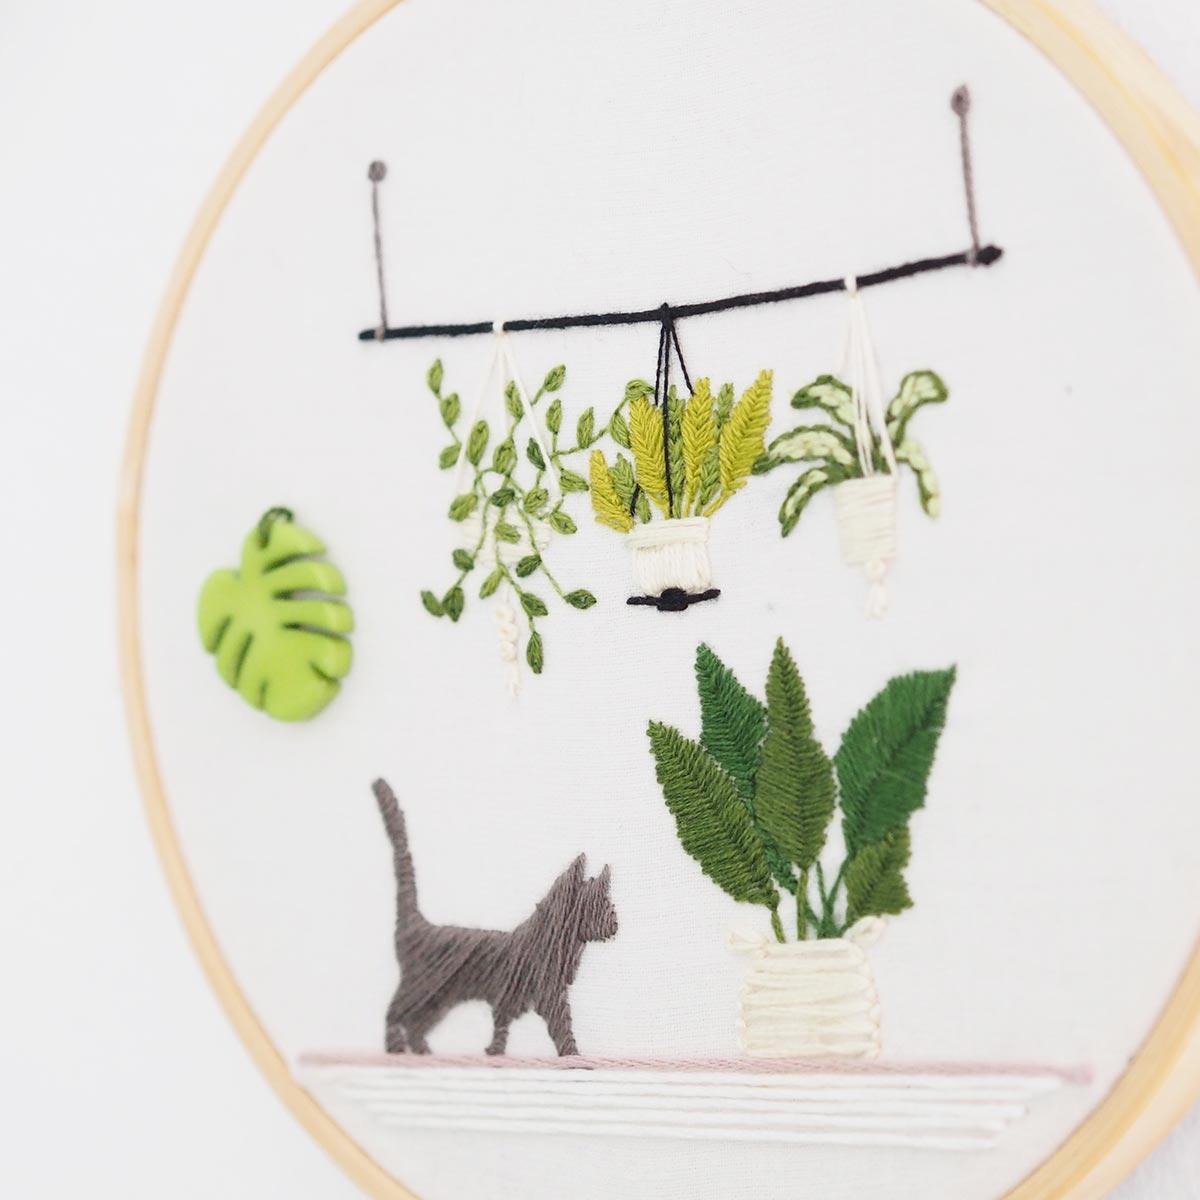 broderie-chat-green-suspension-plantes-monstera-bouzielafee